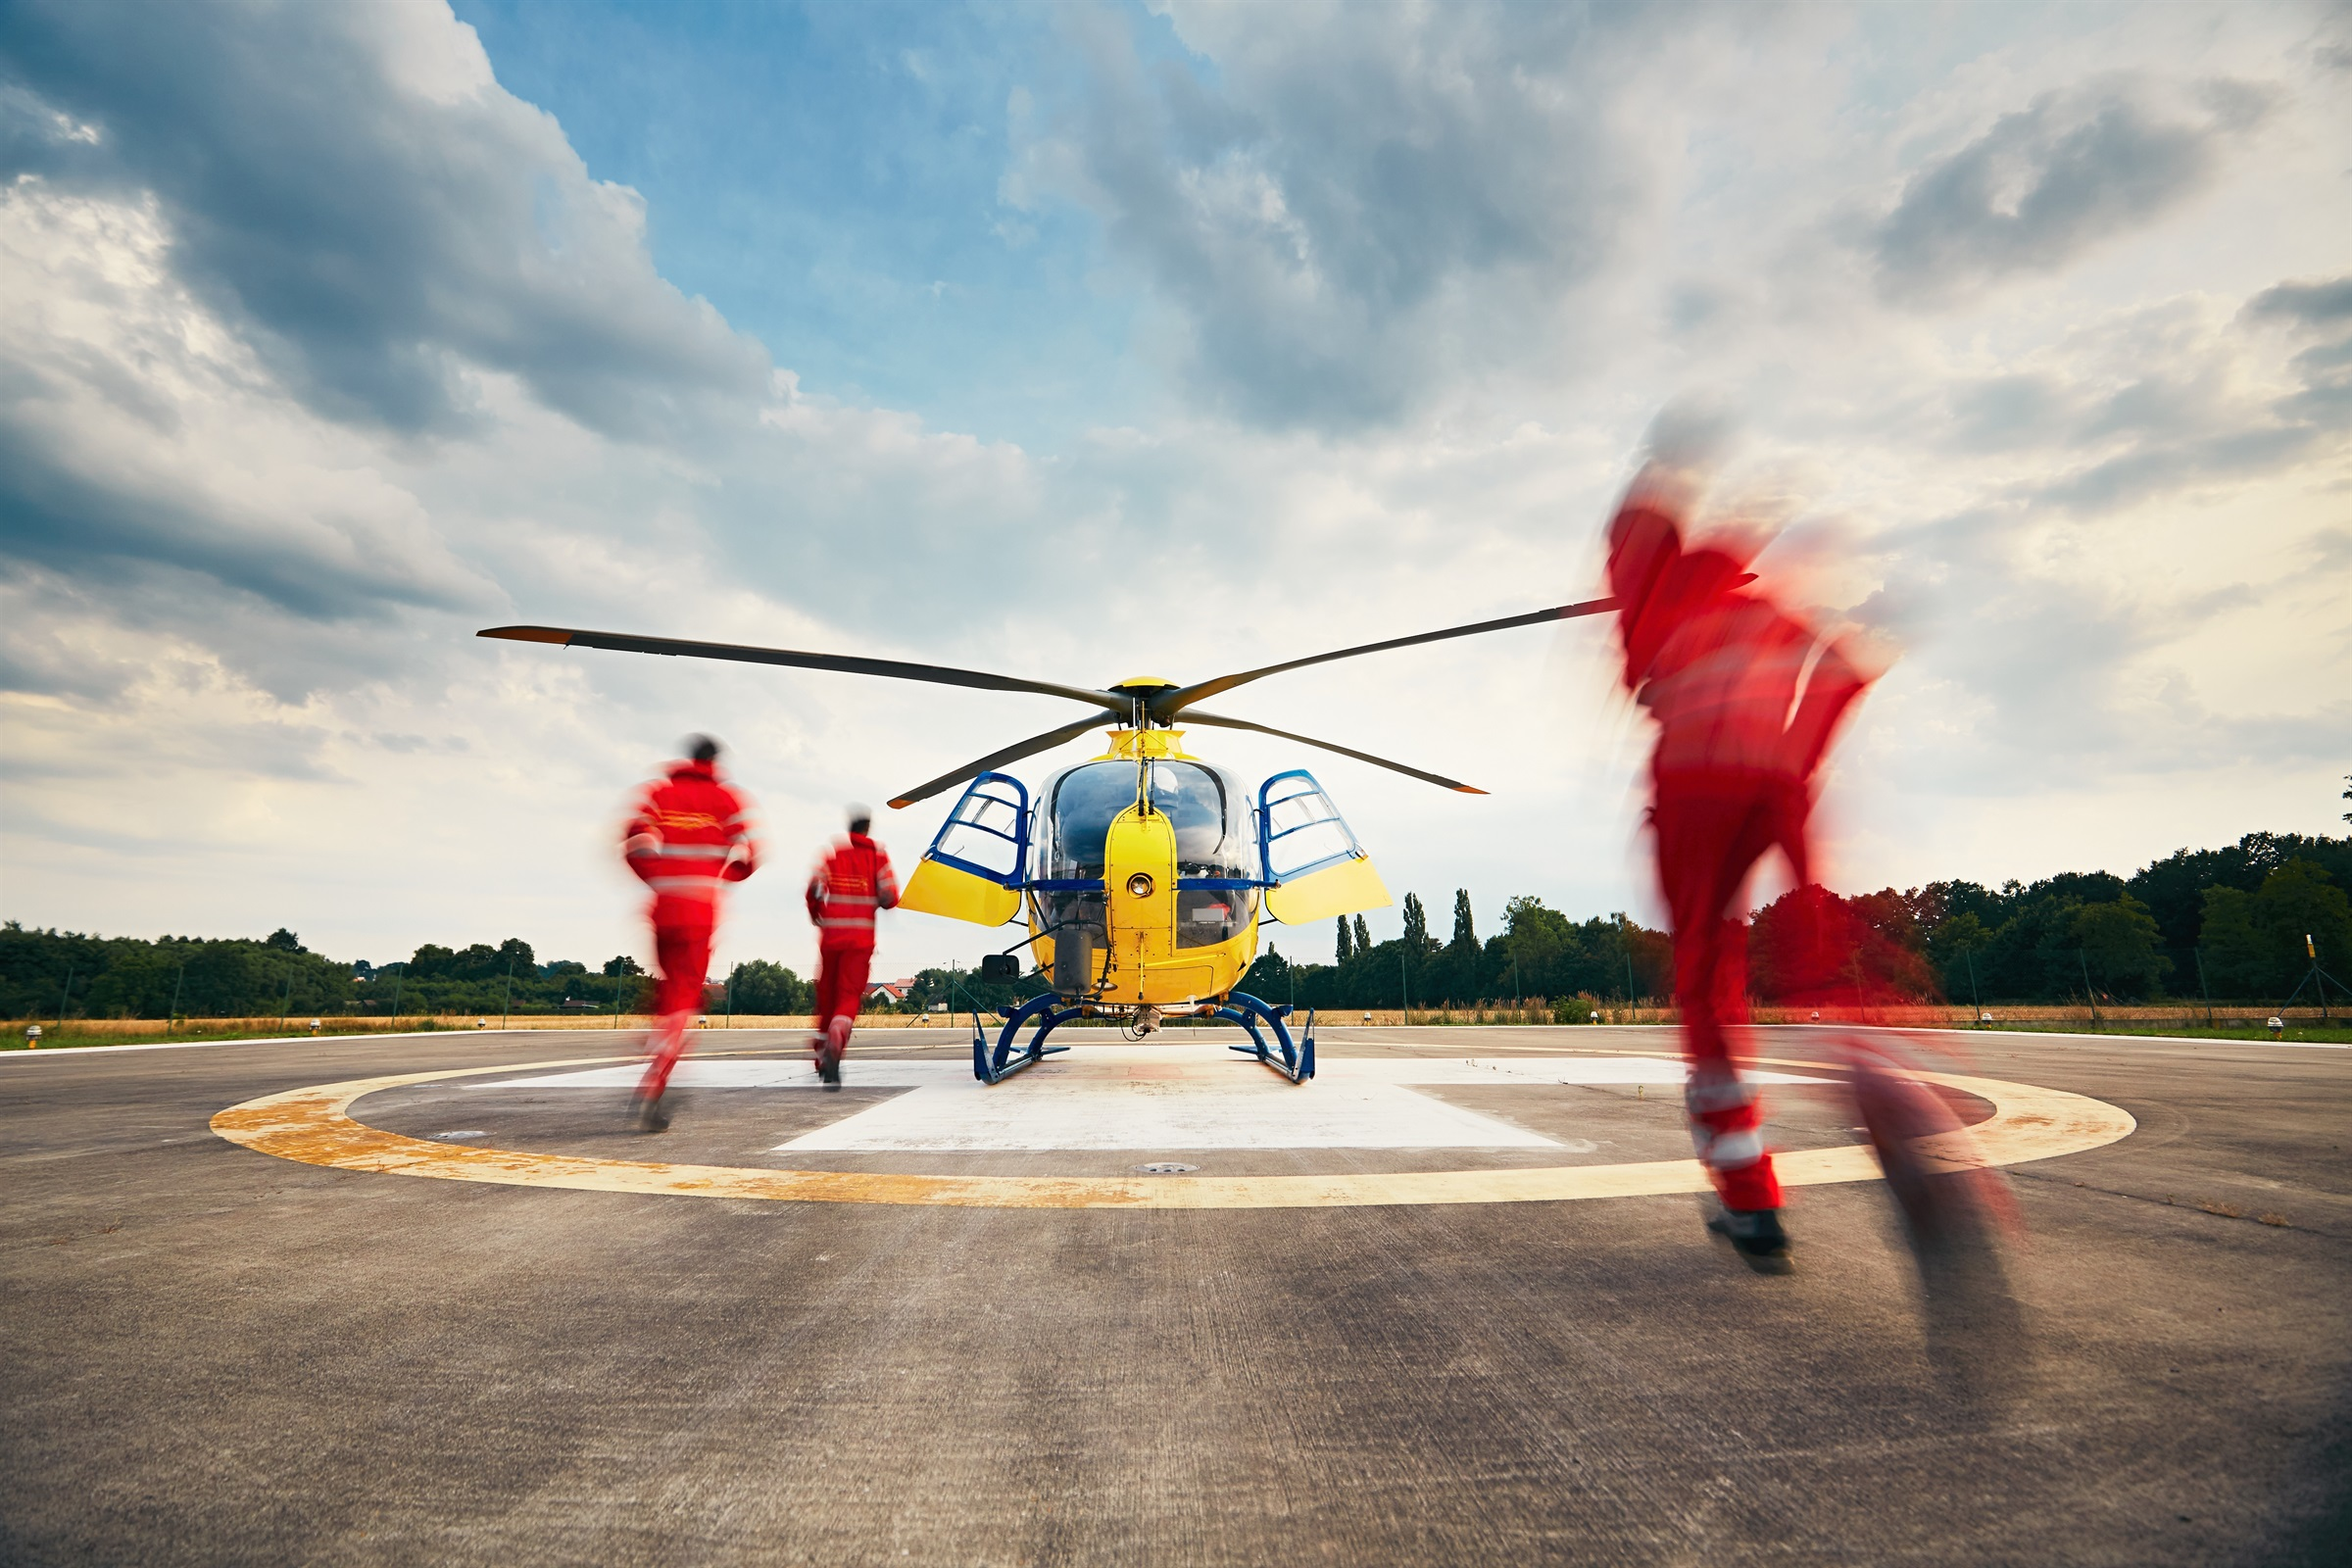 Emergency Review. Helitransport sanitari: les infermeres de l'aire